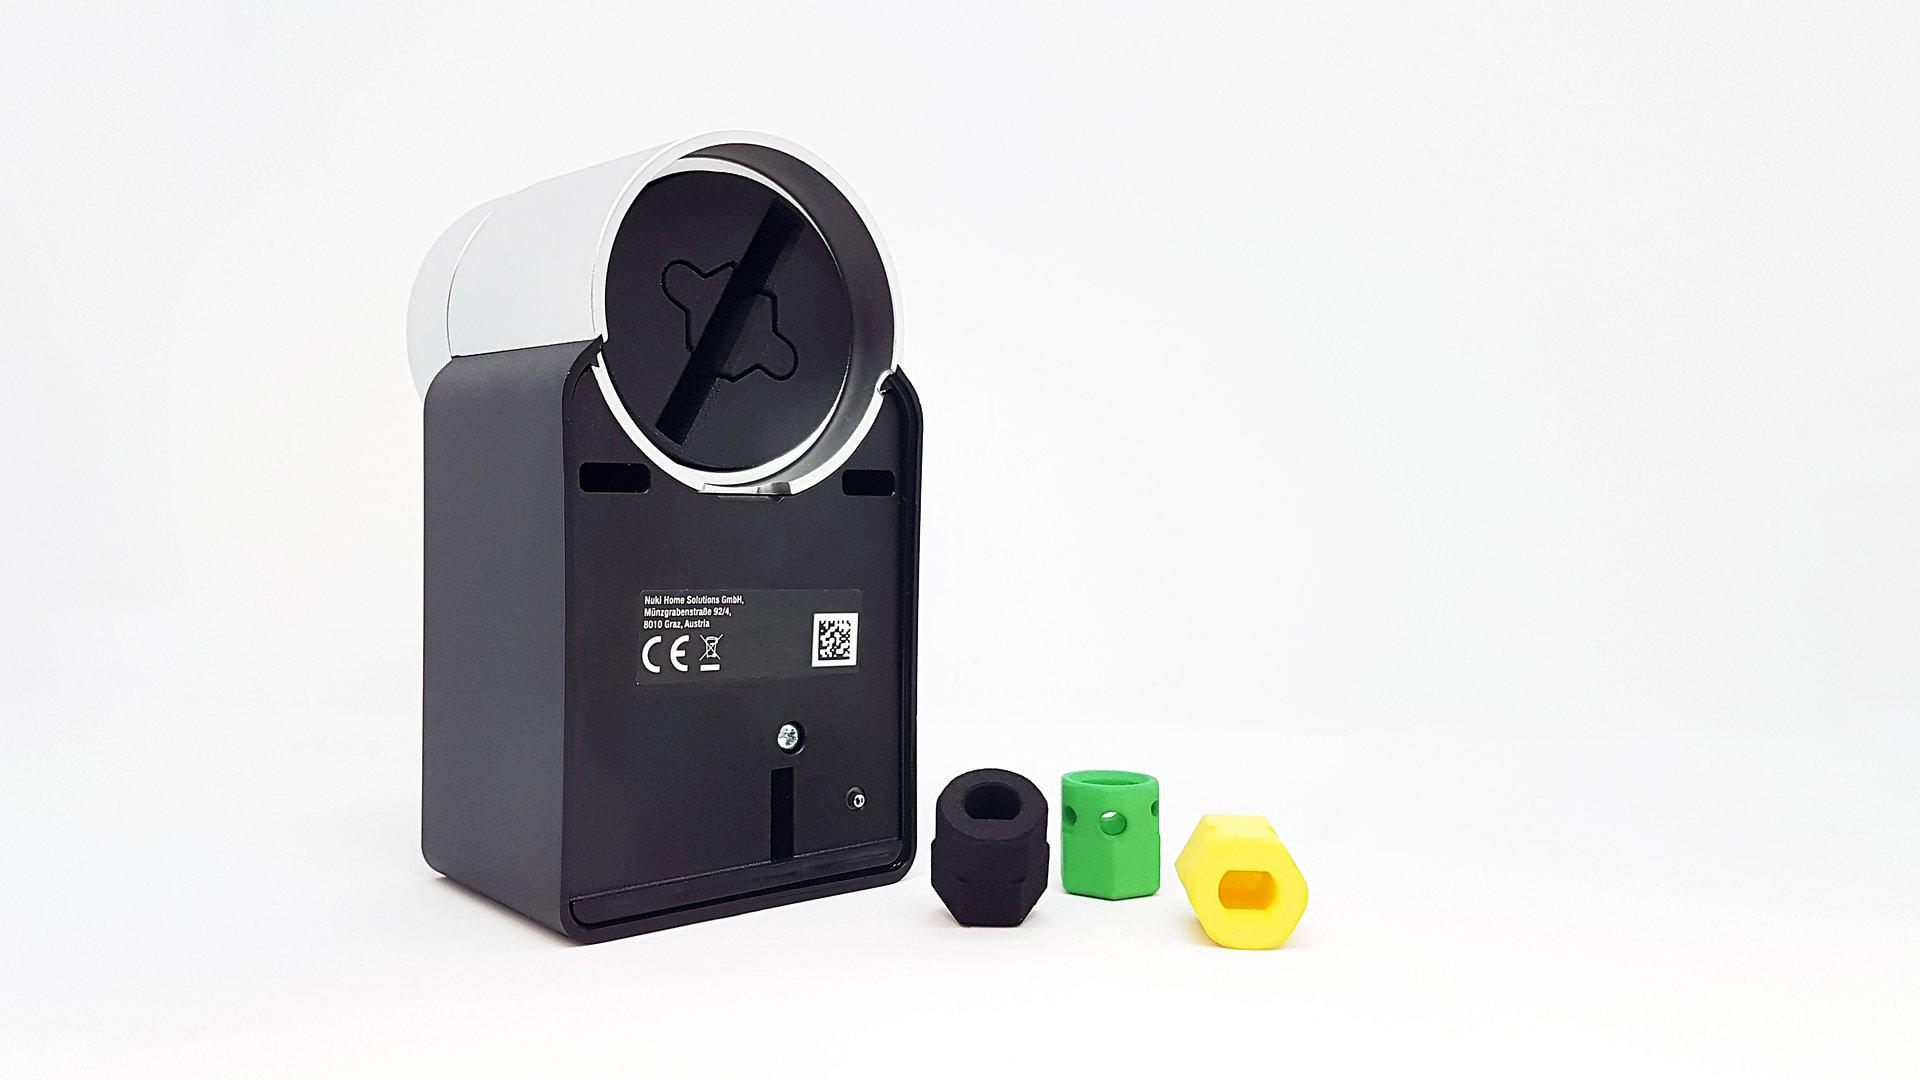 Nuki Smart Lock 2.0 mit Adapter-Set